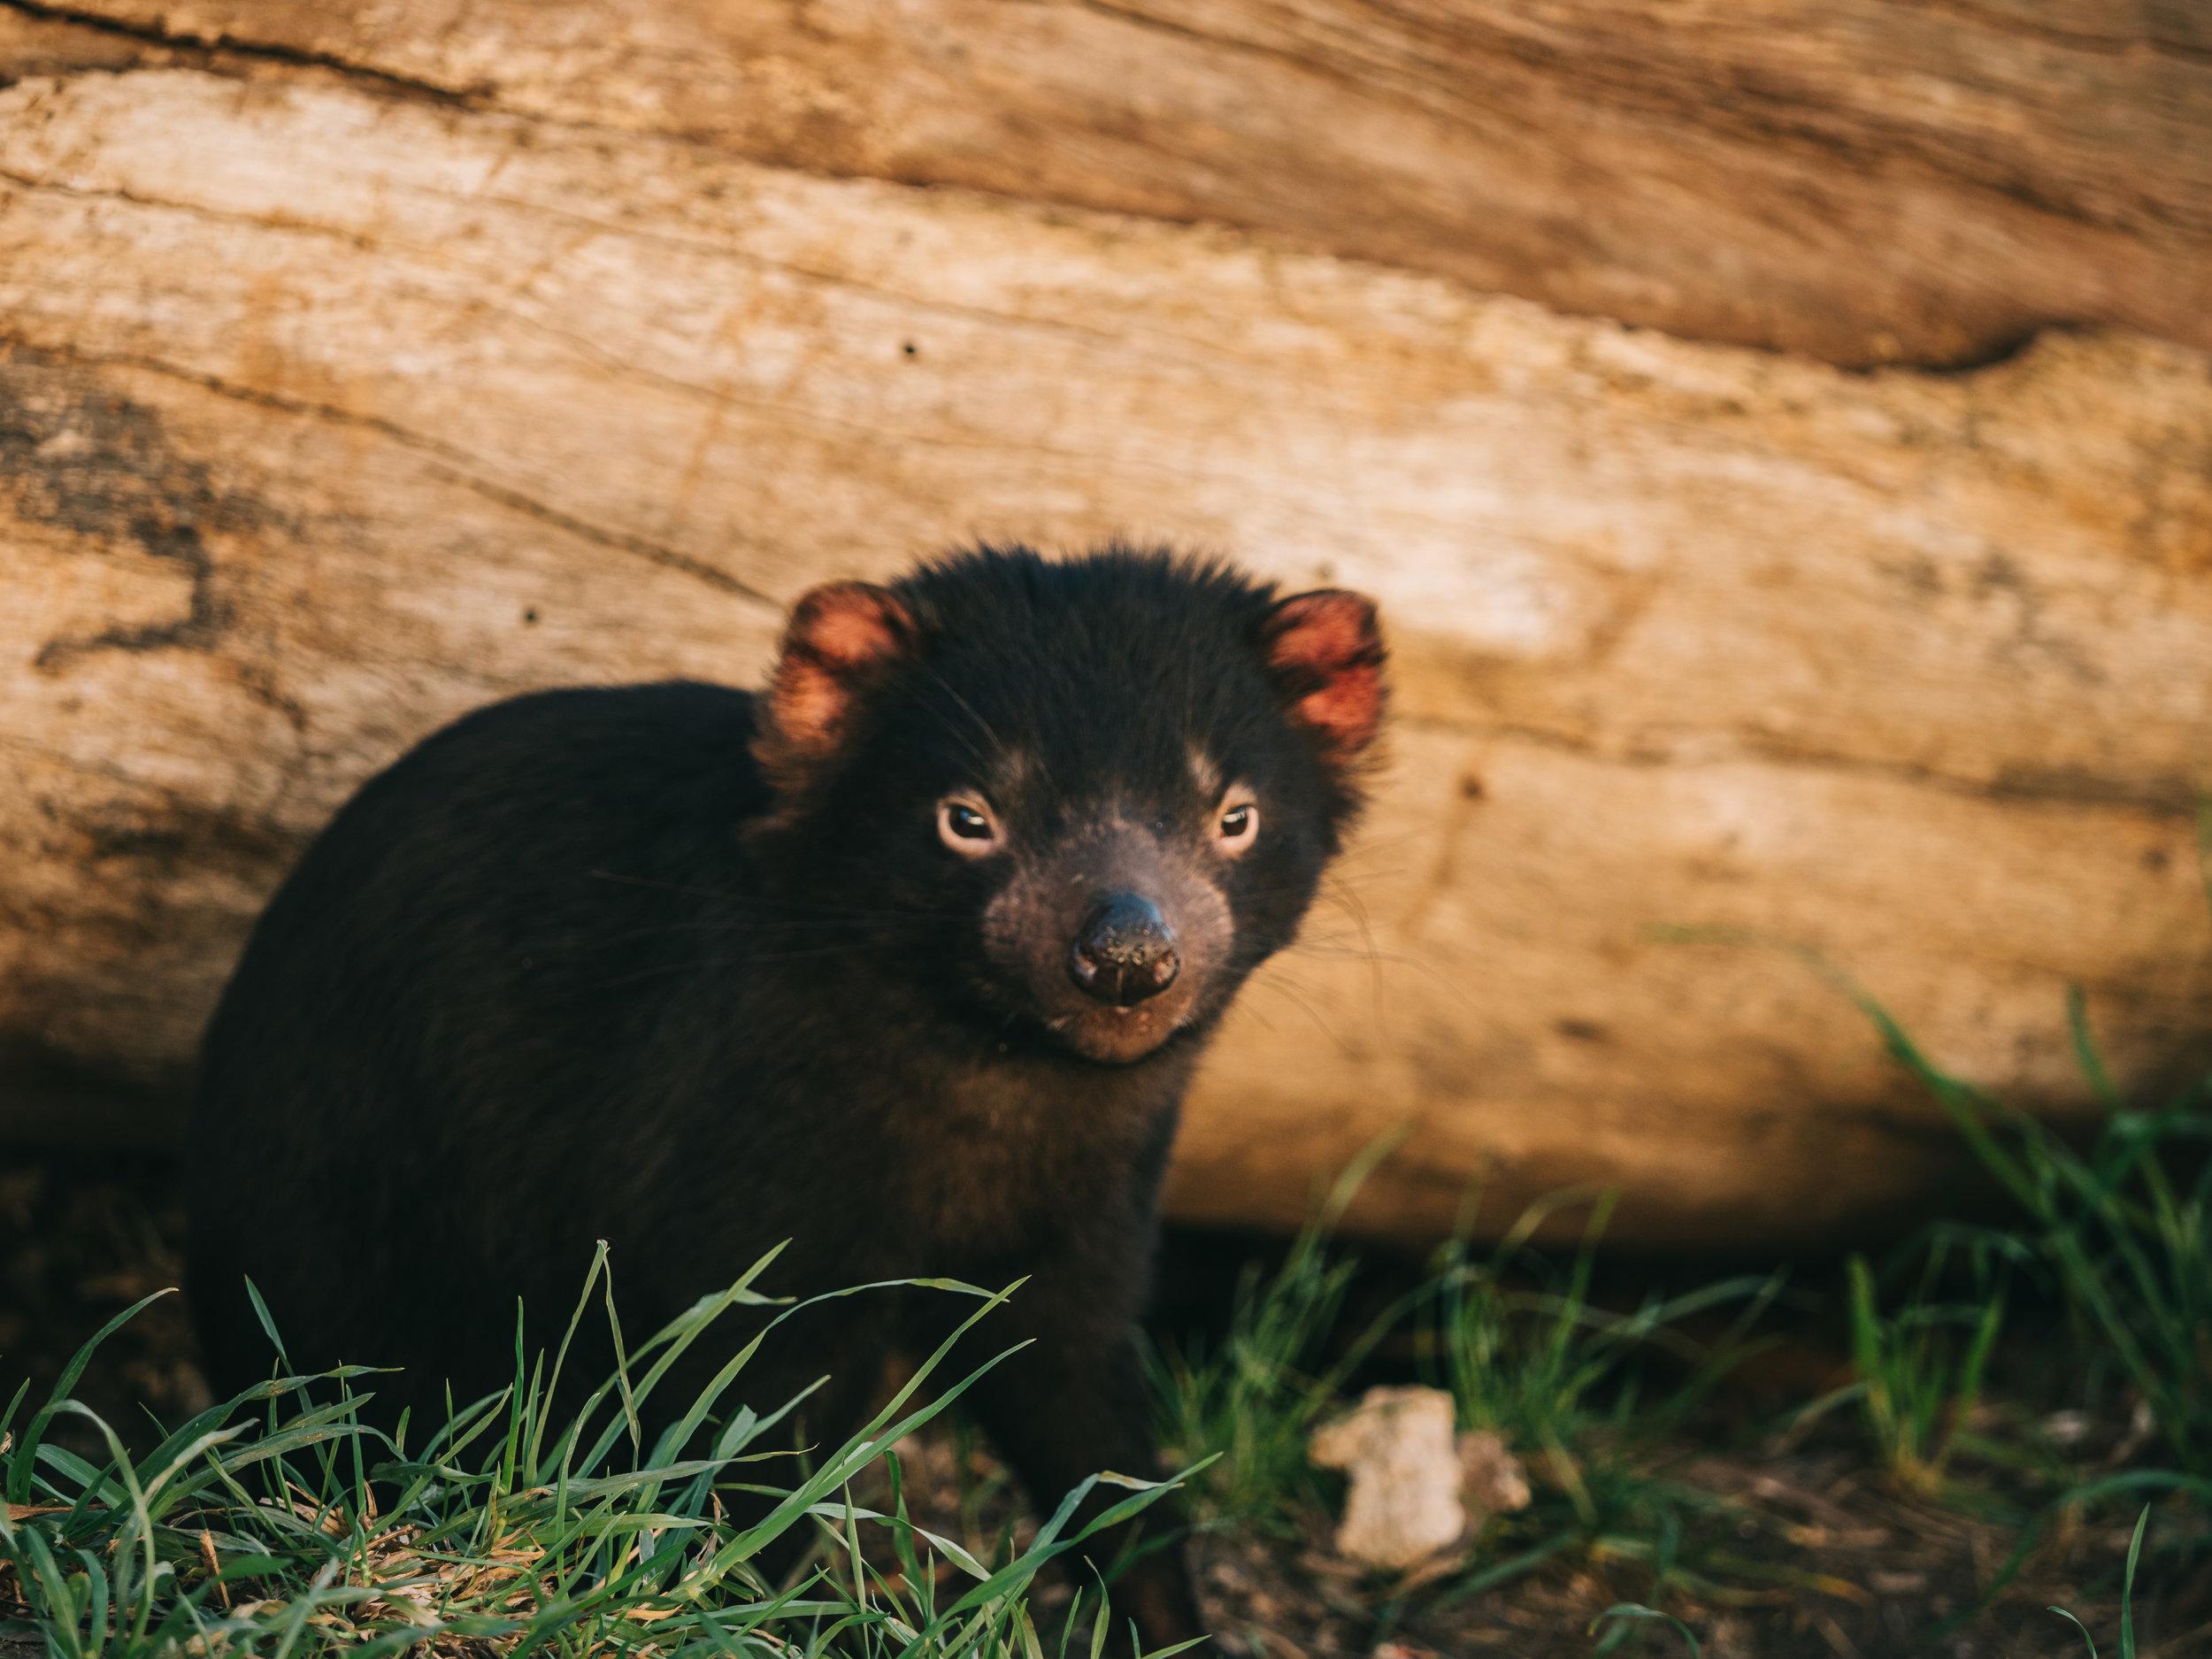 Young Tasmanian Devil, East Coast Nature World, Bicheno, Tasmania